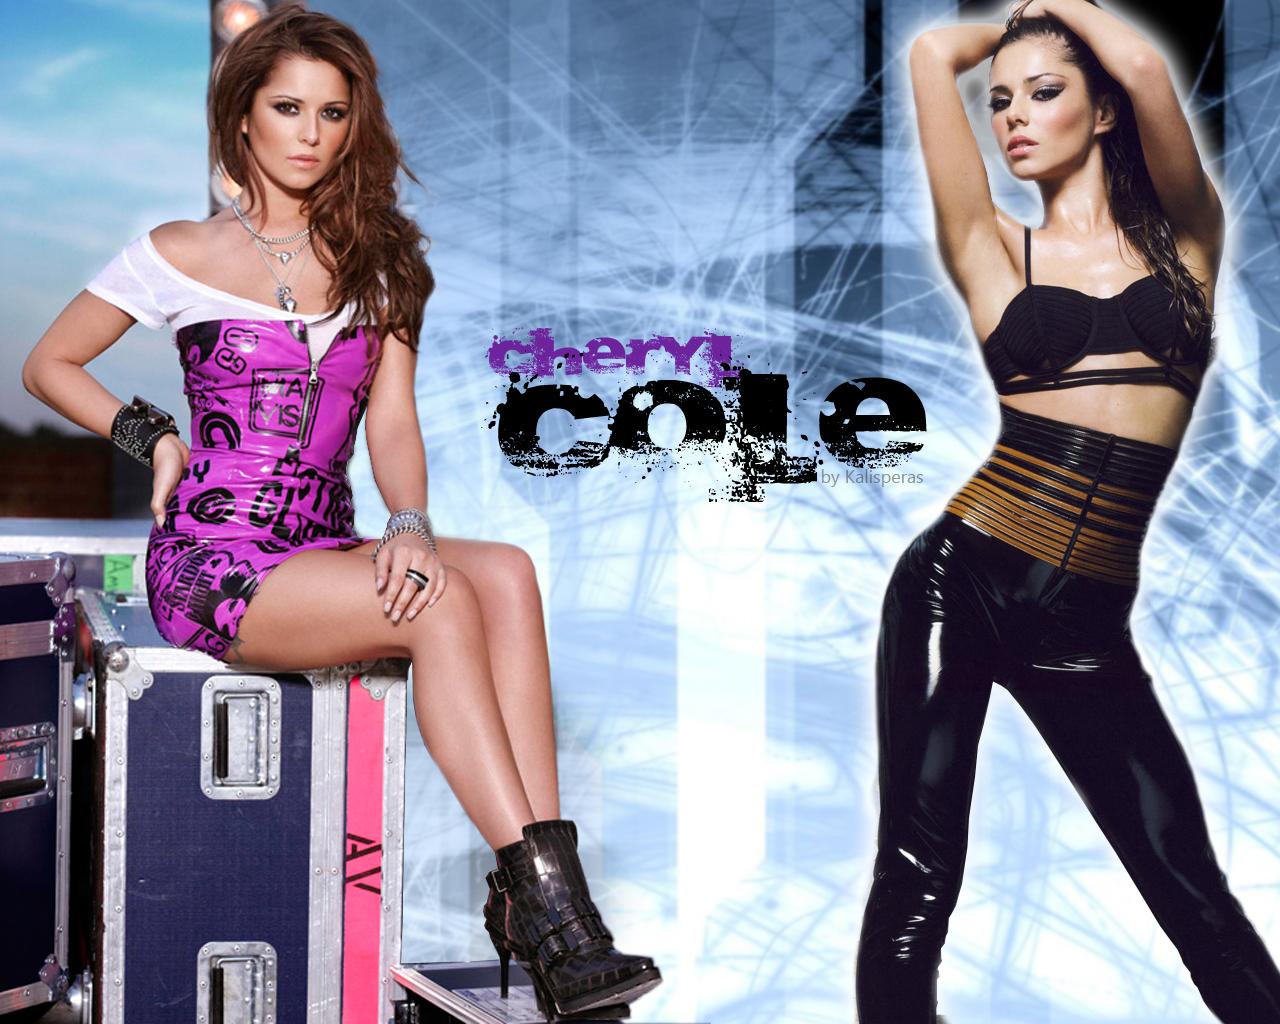 http://2.bp.blogspot.com/-sdBxaqay-Tw/Tmc_Fhz185I/AAAAAAAACDQ/0I_2fHRyRC4/s1600/Hot+Cheryl+Cole+Pictures+%25281%2529.jpg